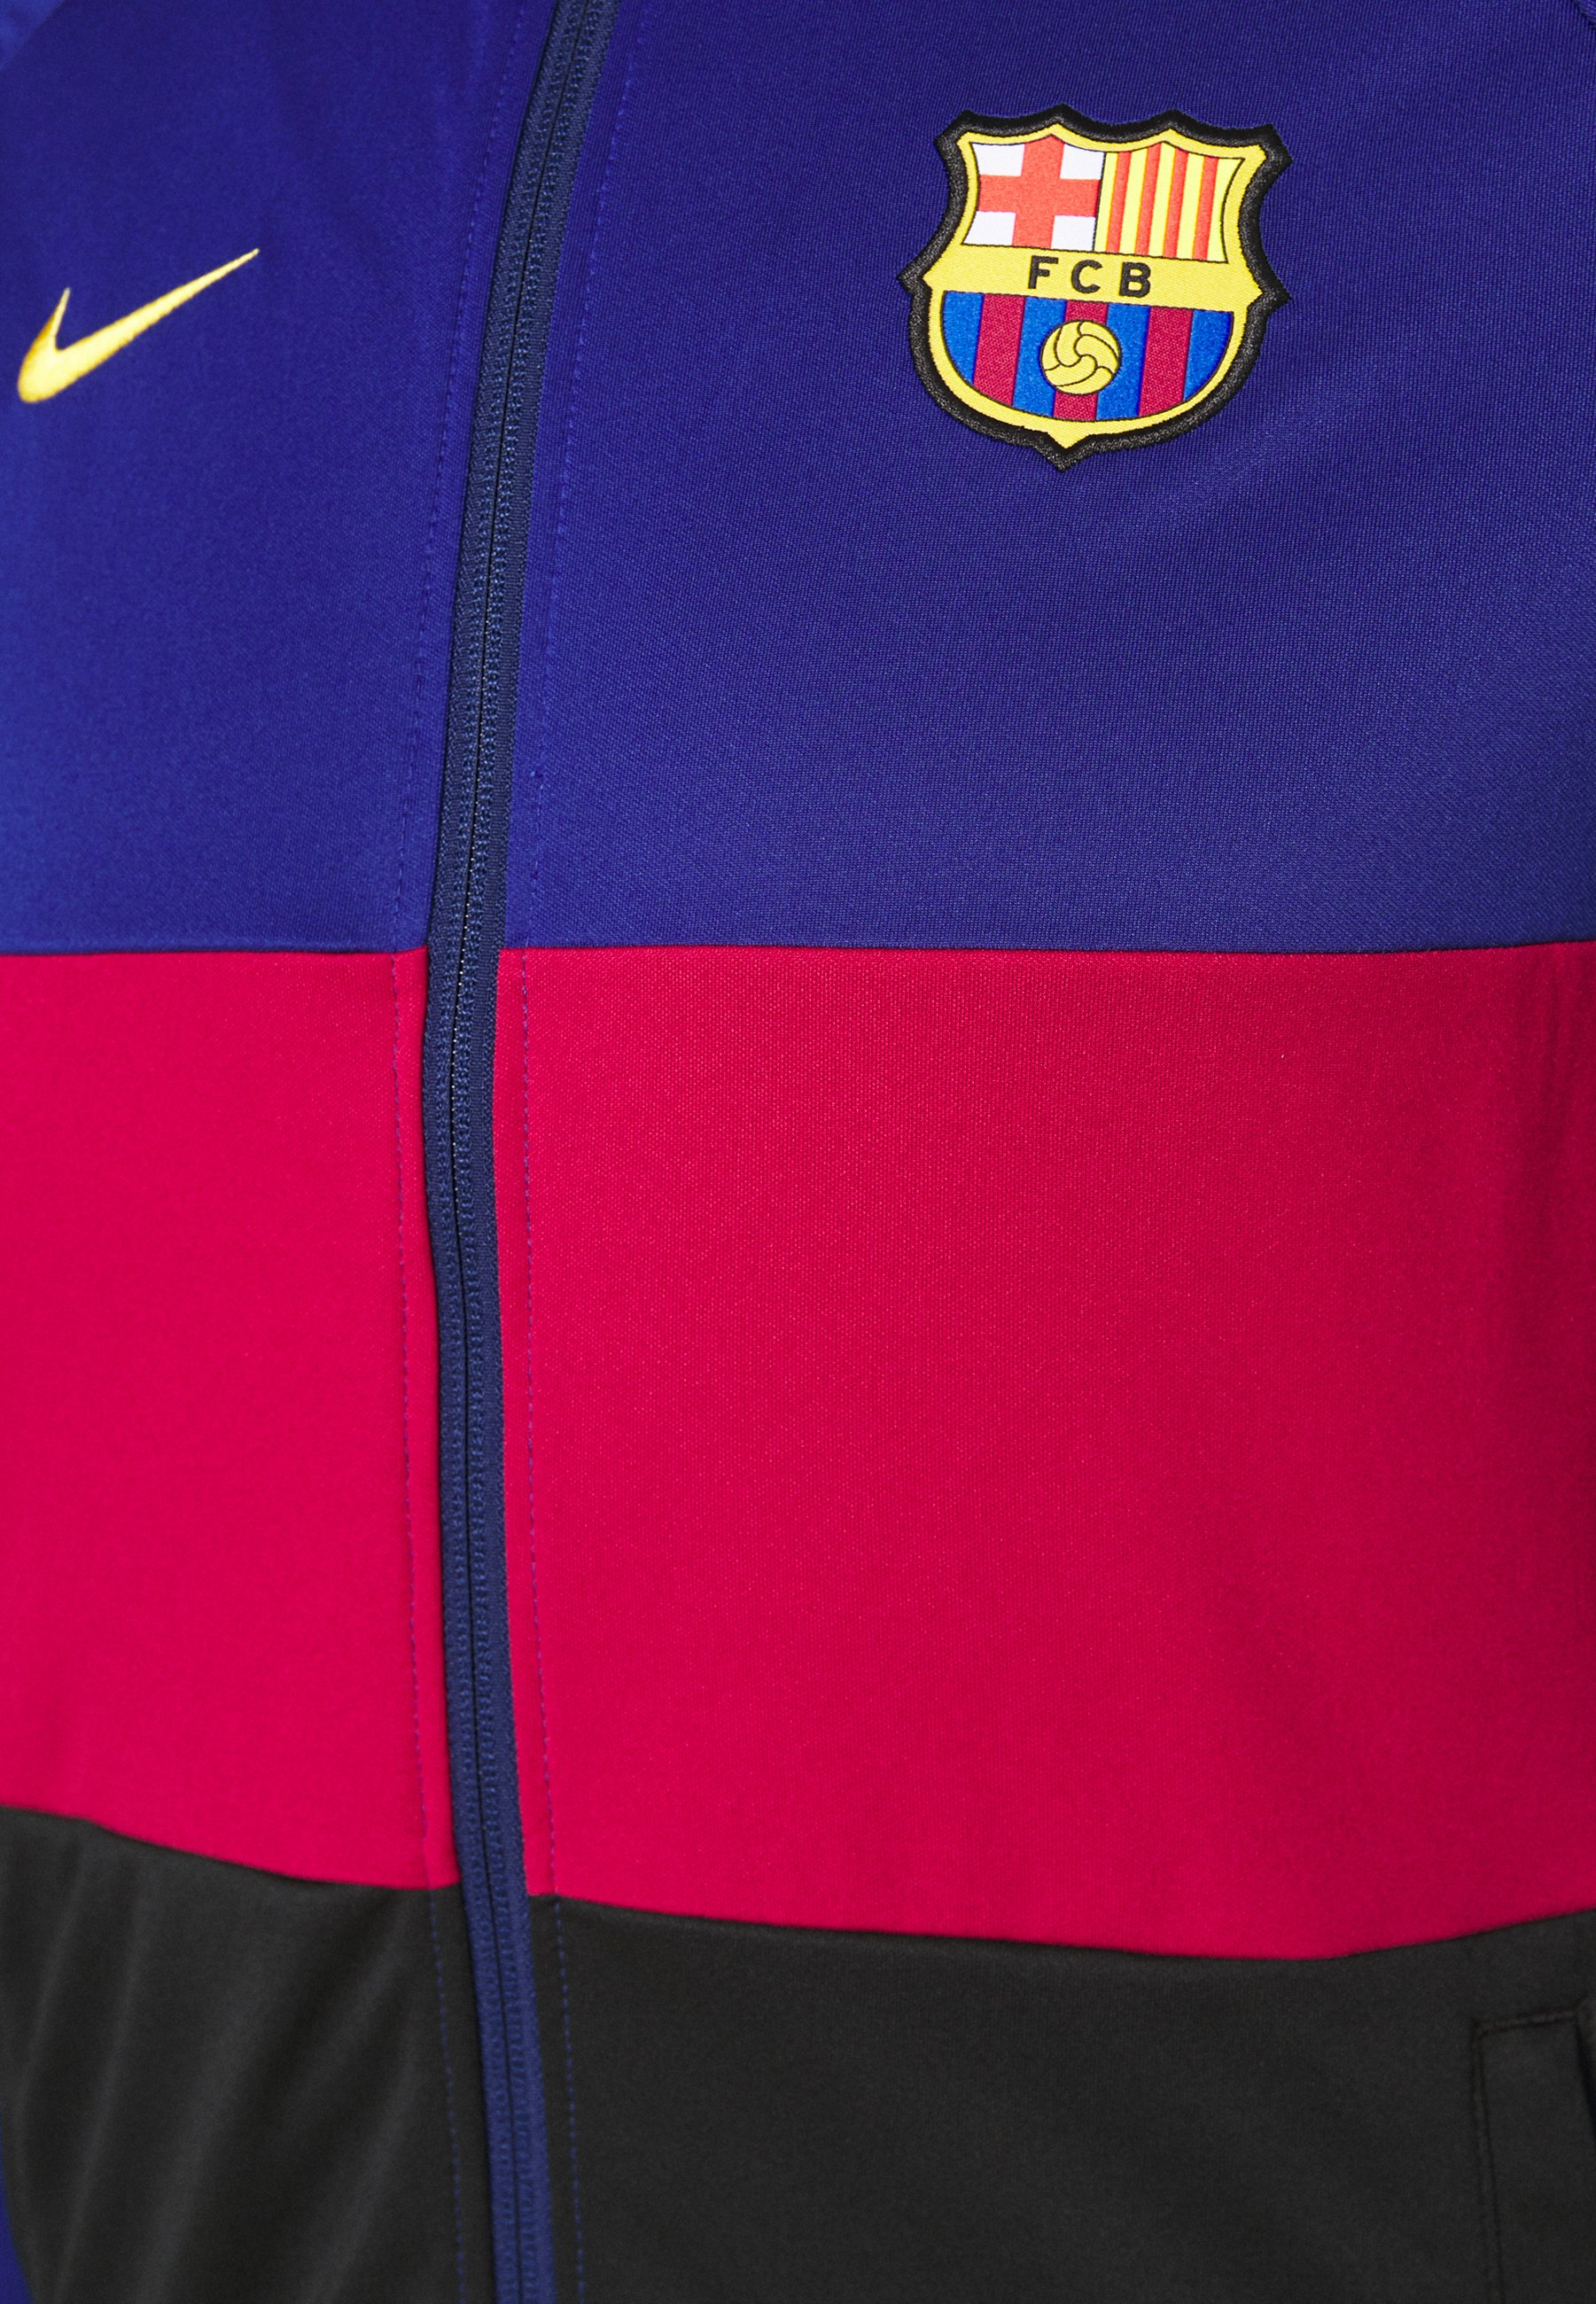 FC BARCELONA Klubbkläder deep royal bluenoble redamarillo